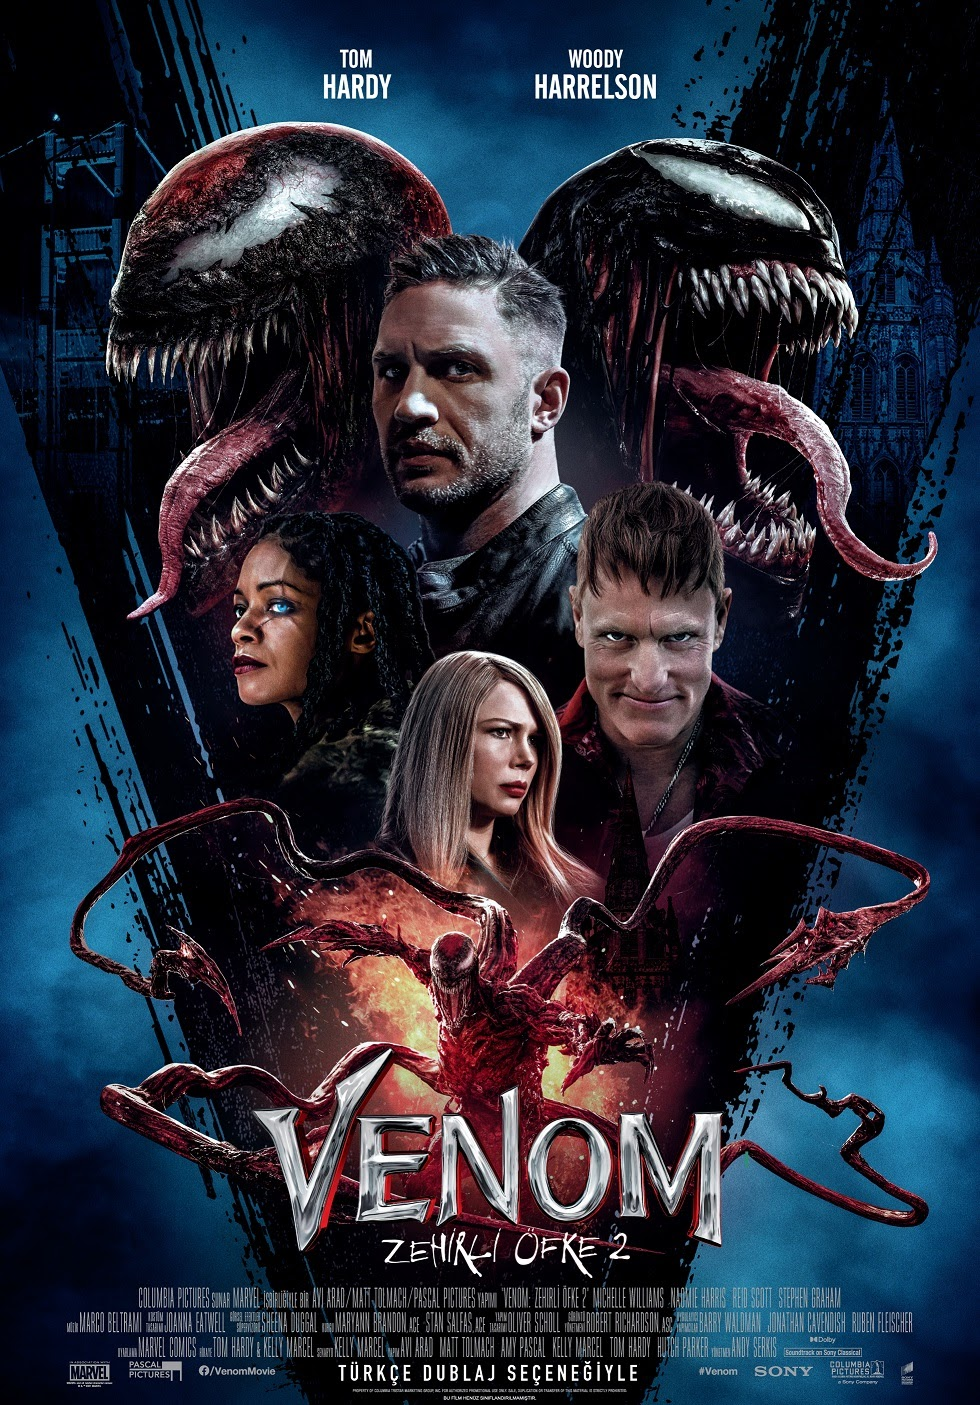 Venom: Zehirli Öfke 2 - Venom: Let There Be Carnage (2021)